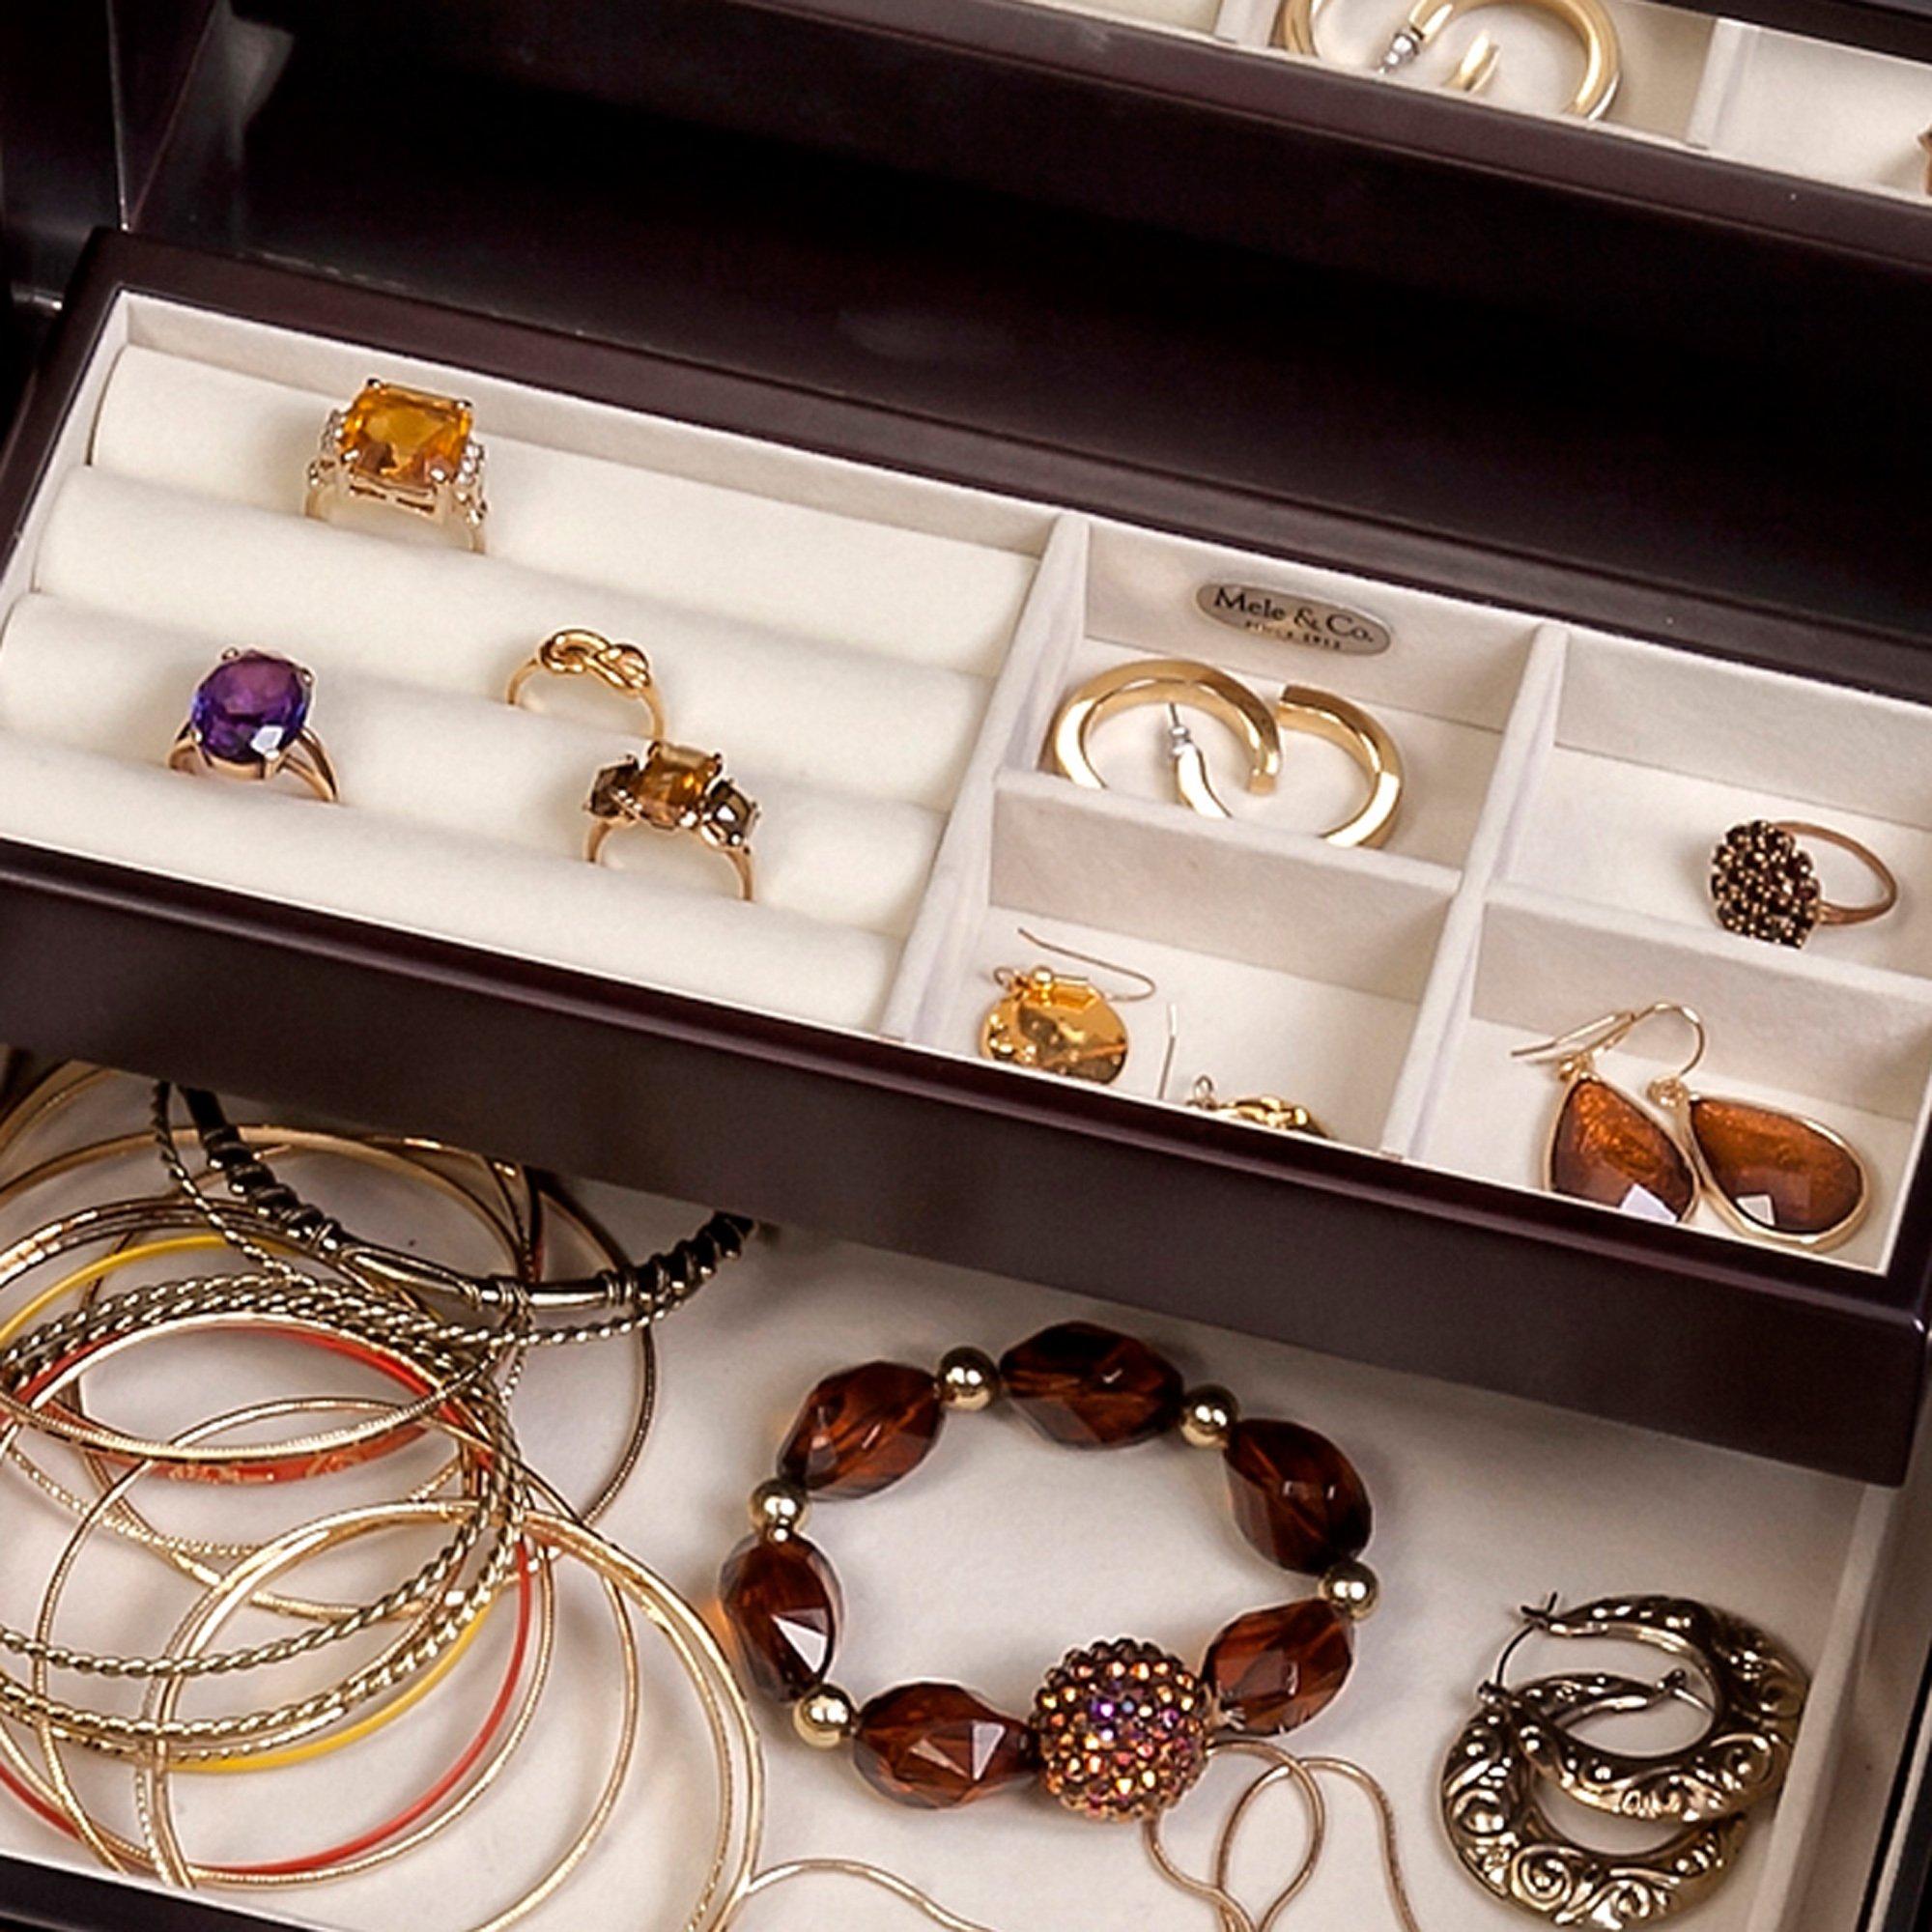 Mele & Co. Juliette Wooden Jewelry Box (Java Finish) by Mele & Co. (Image #4)